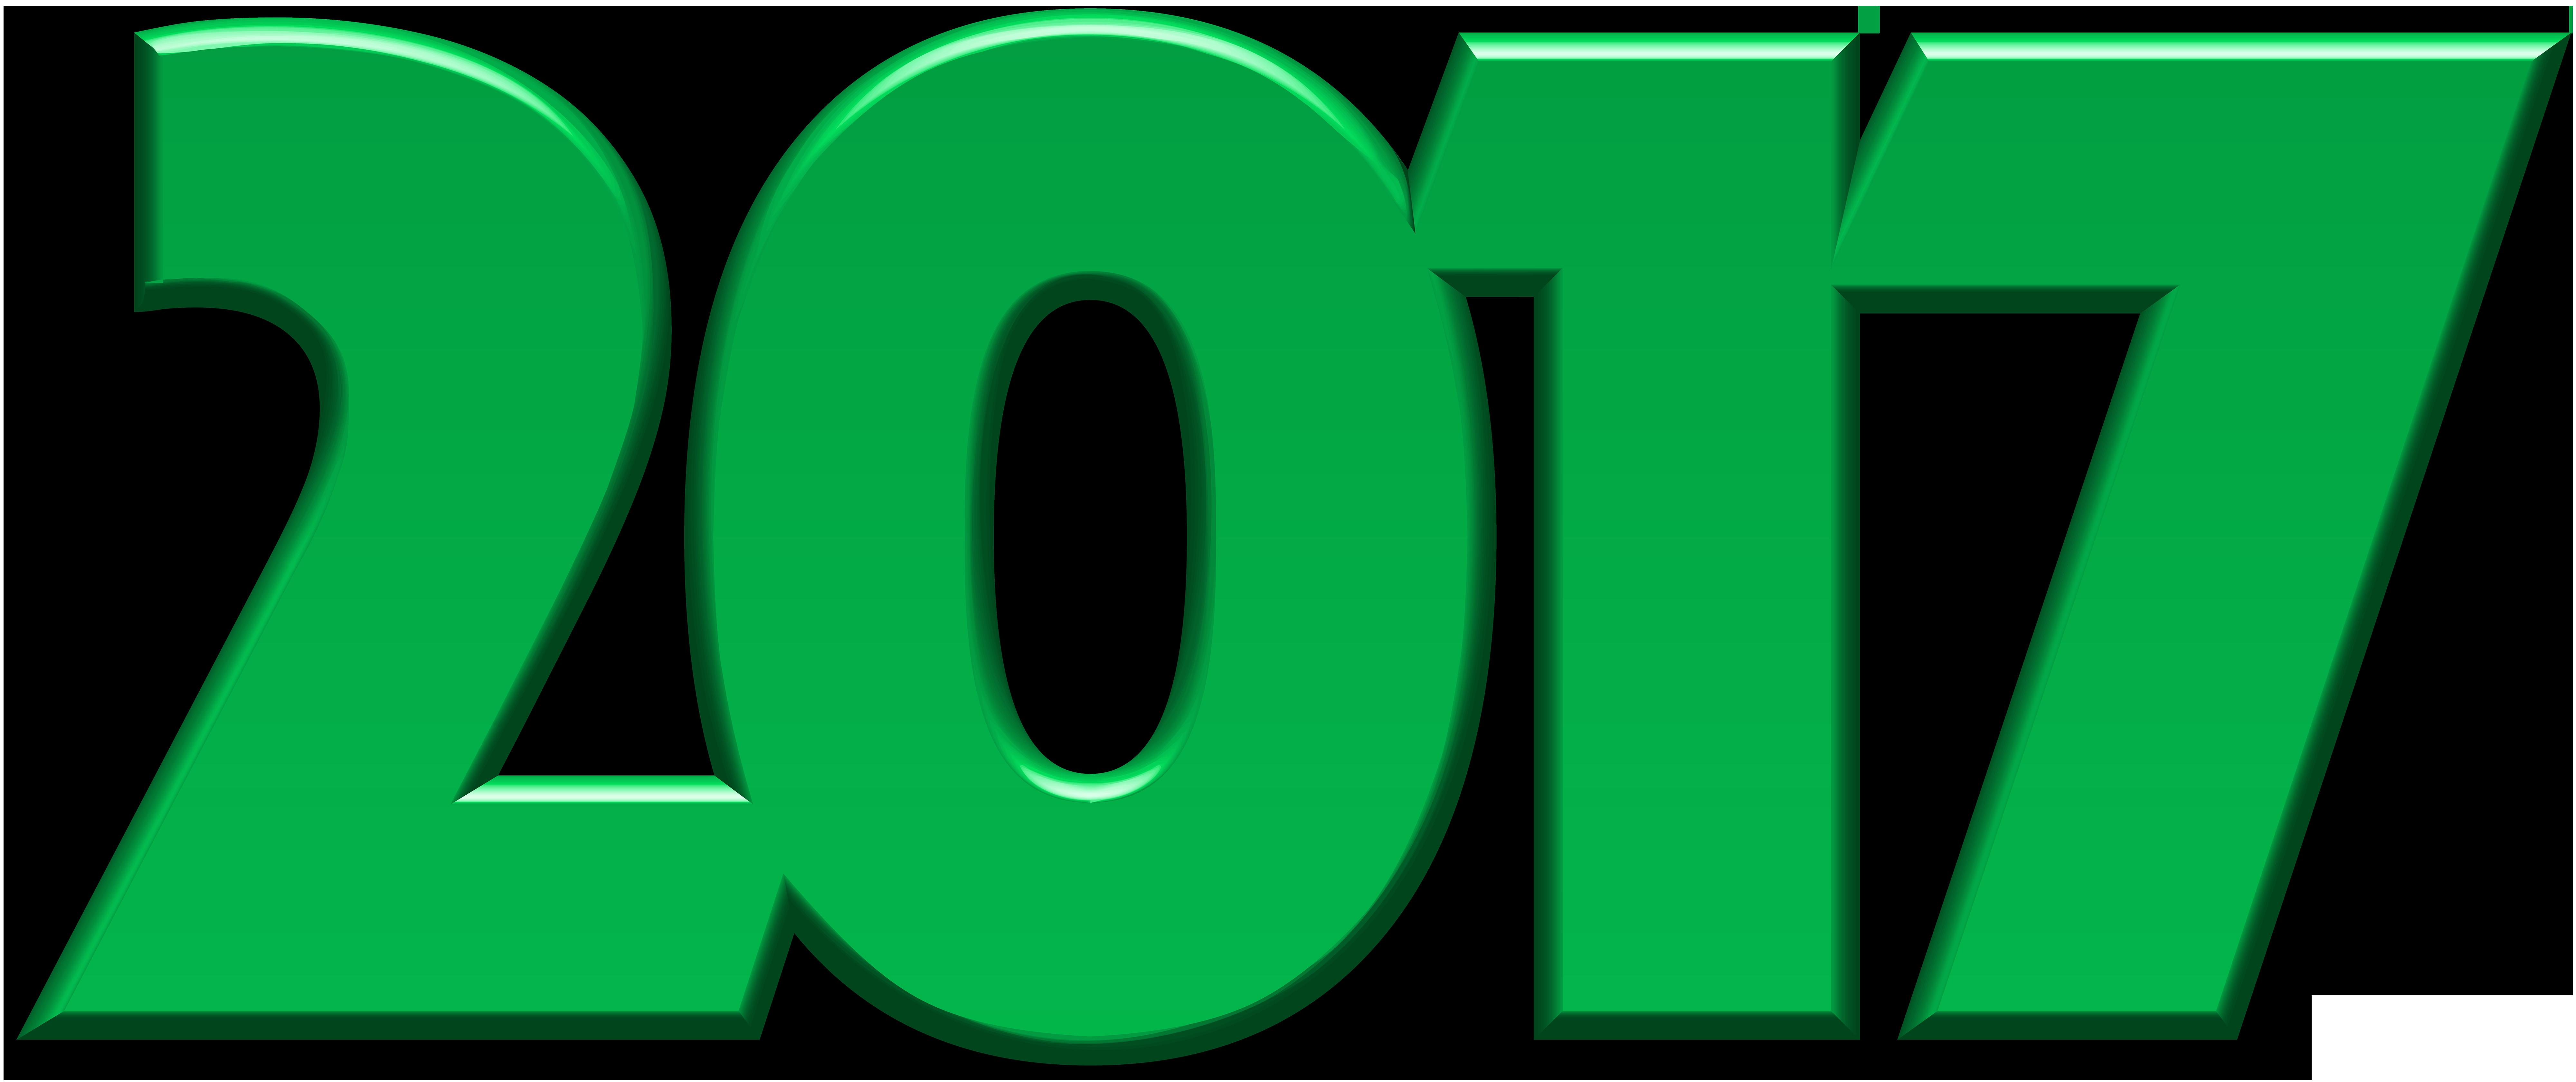 2017 clipart.  green png clip